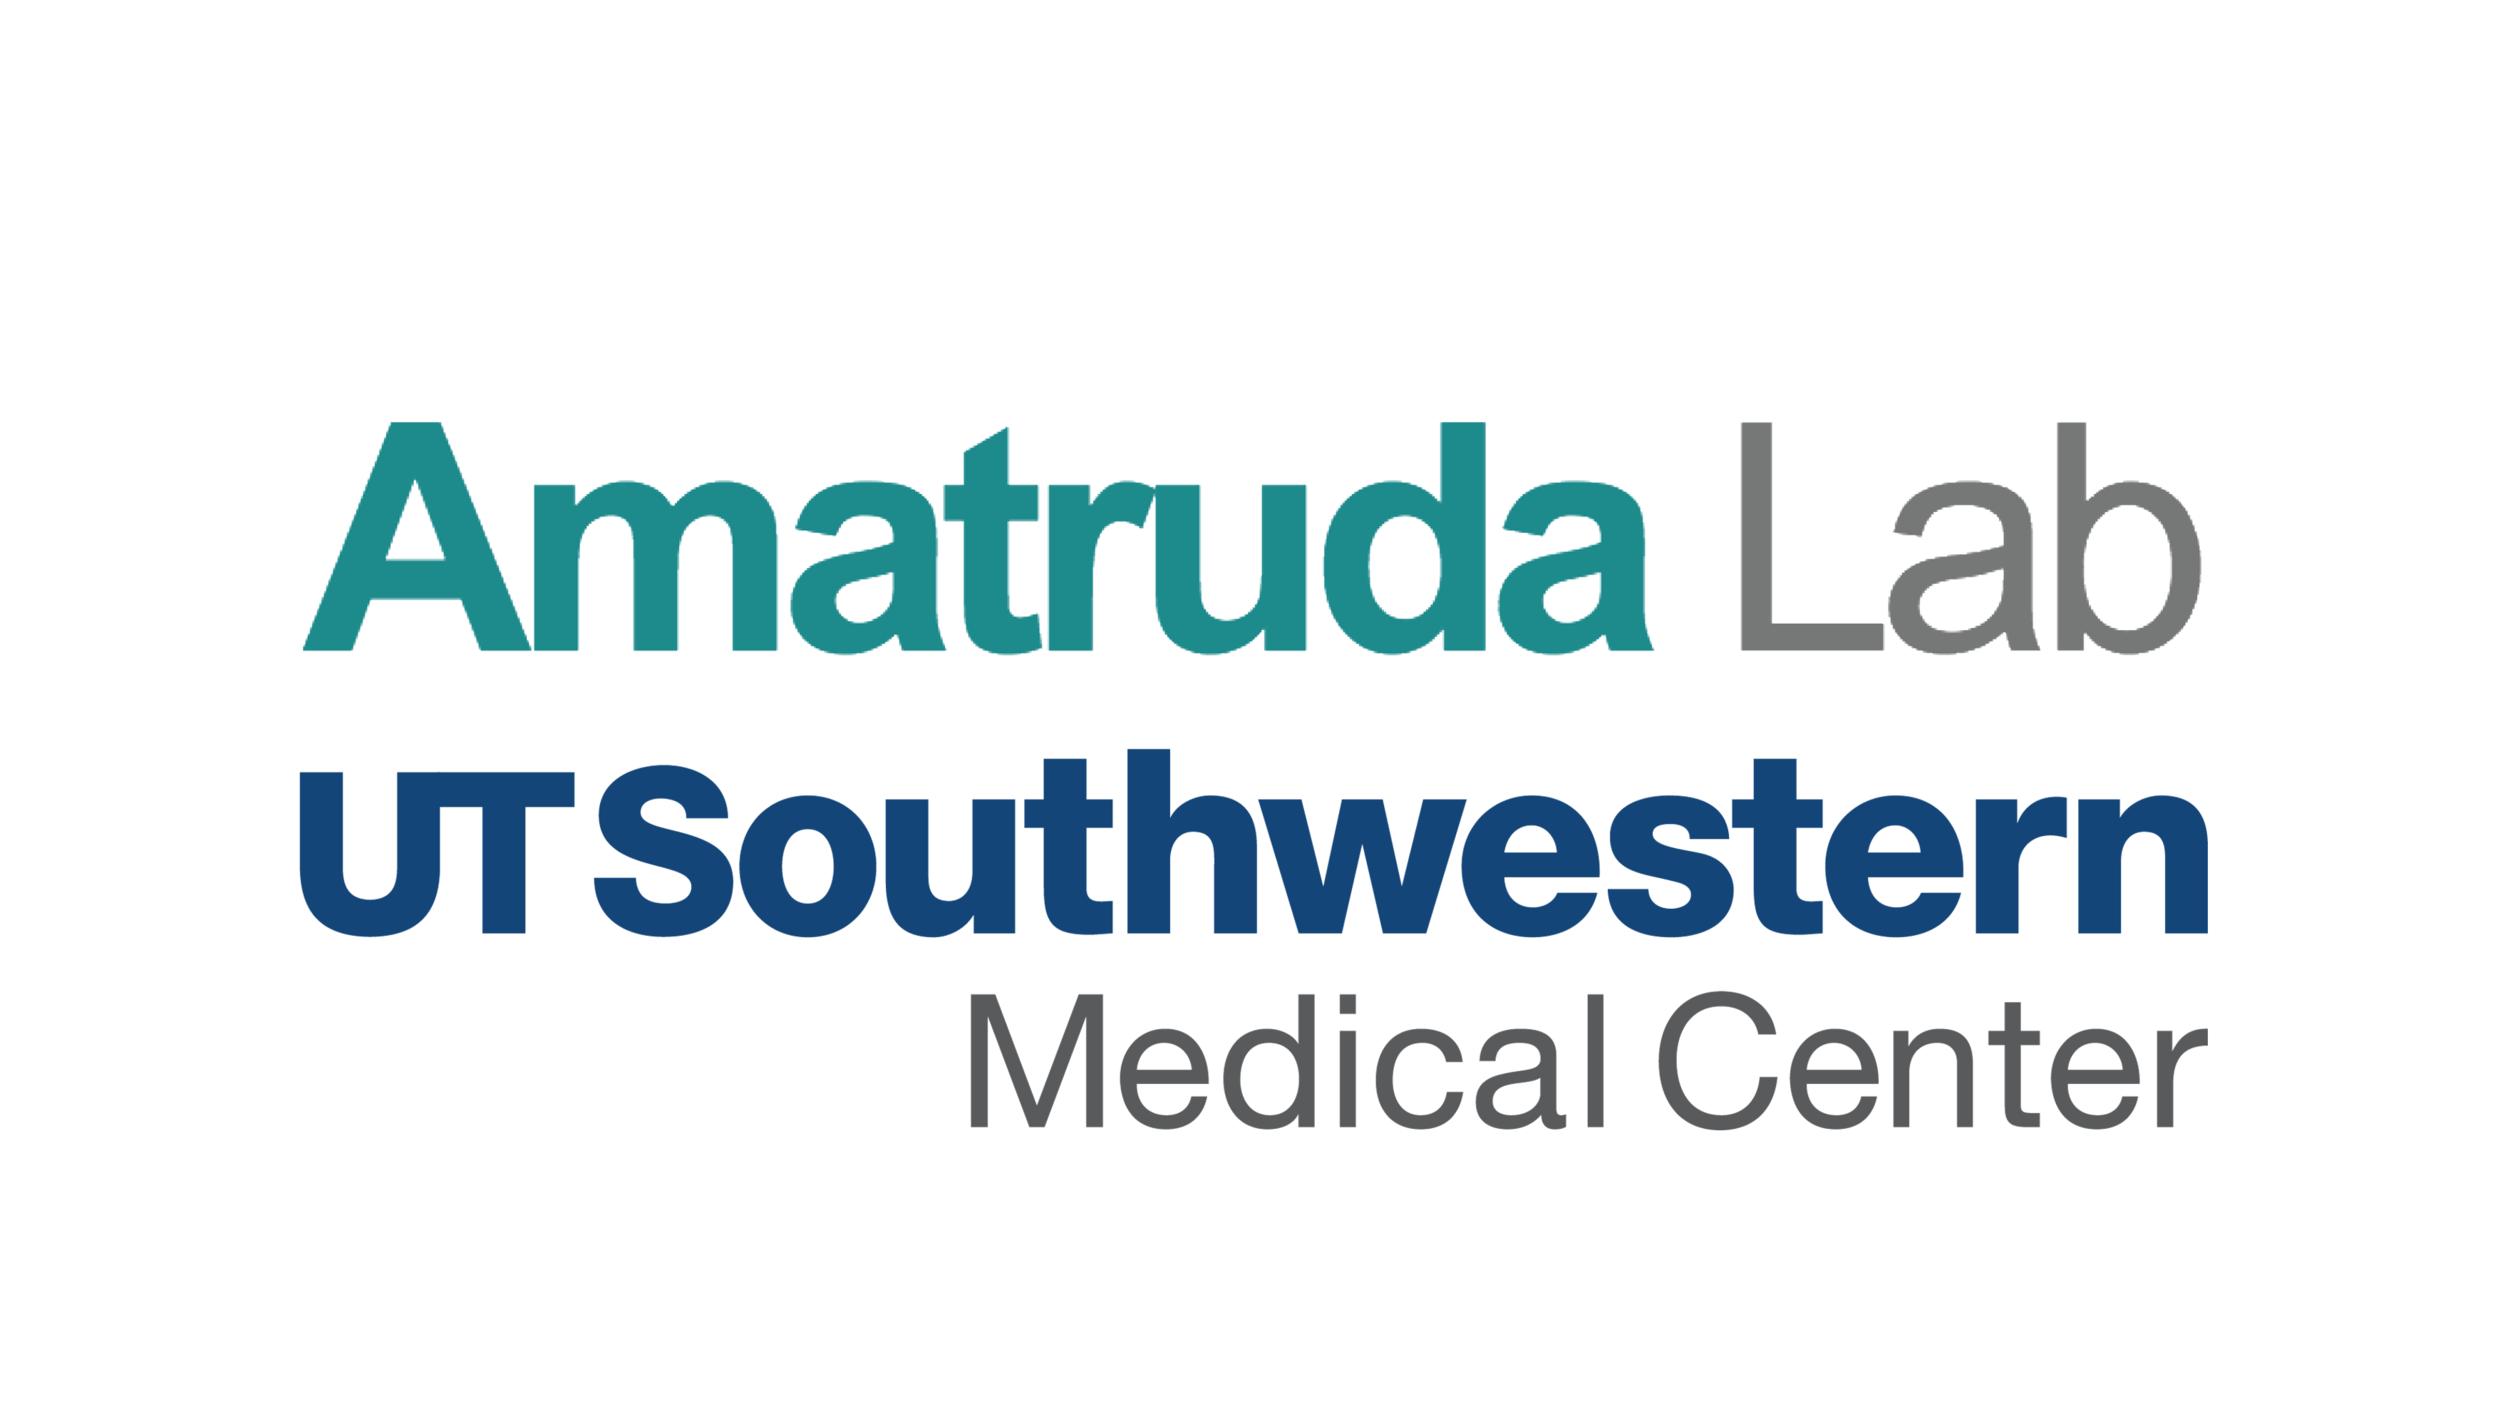 asociacion-anita-amatruda-lab-utsouthwestern-medical-center-logo-investigacion-tumor-celulas-germinales-germ-cell-tumor-research-jaume-mora-sant-joan-de-deu